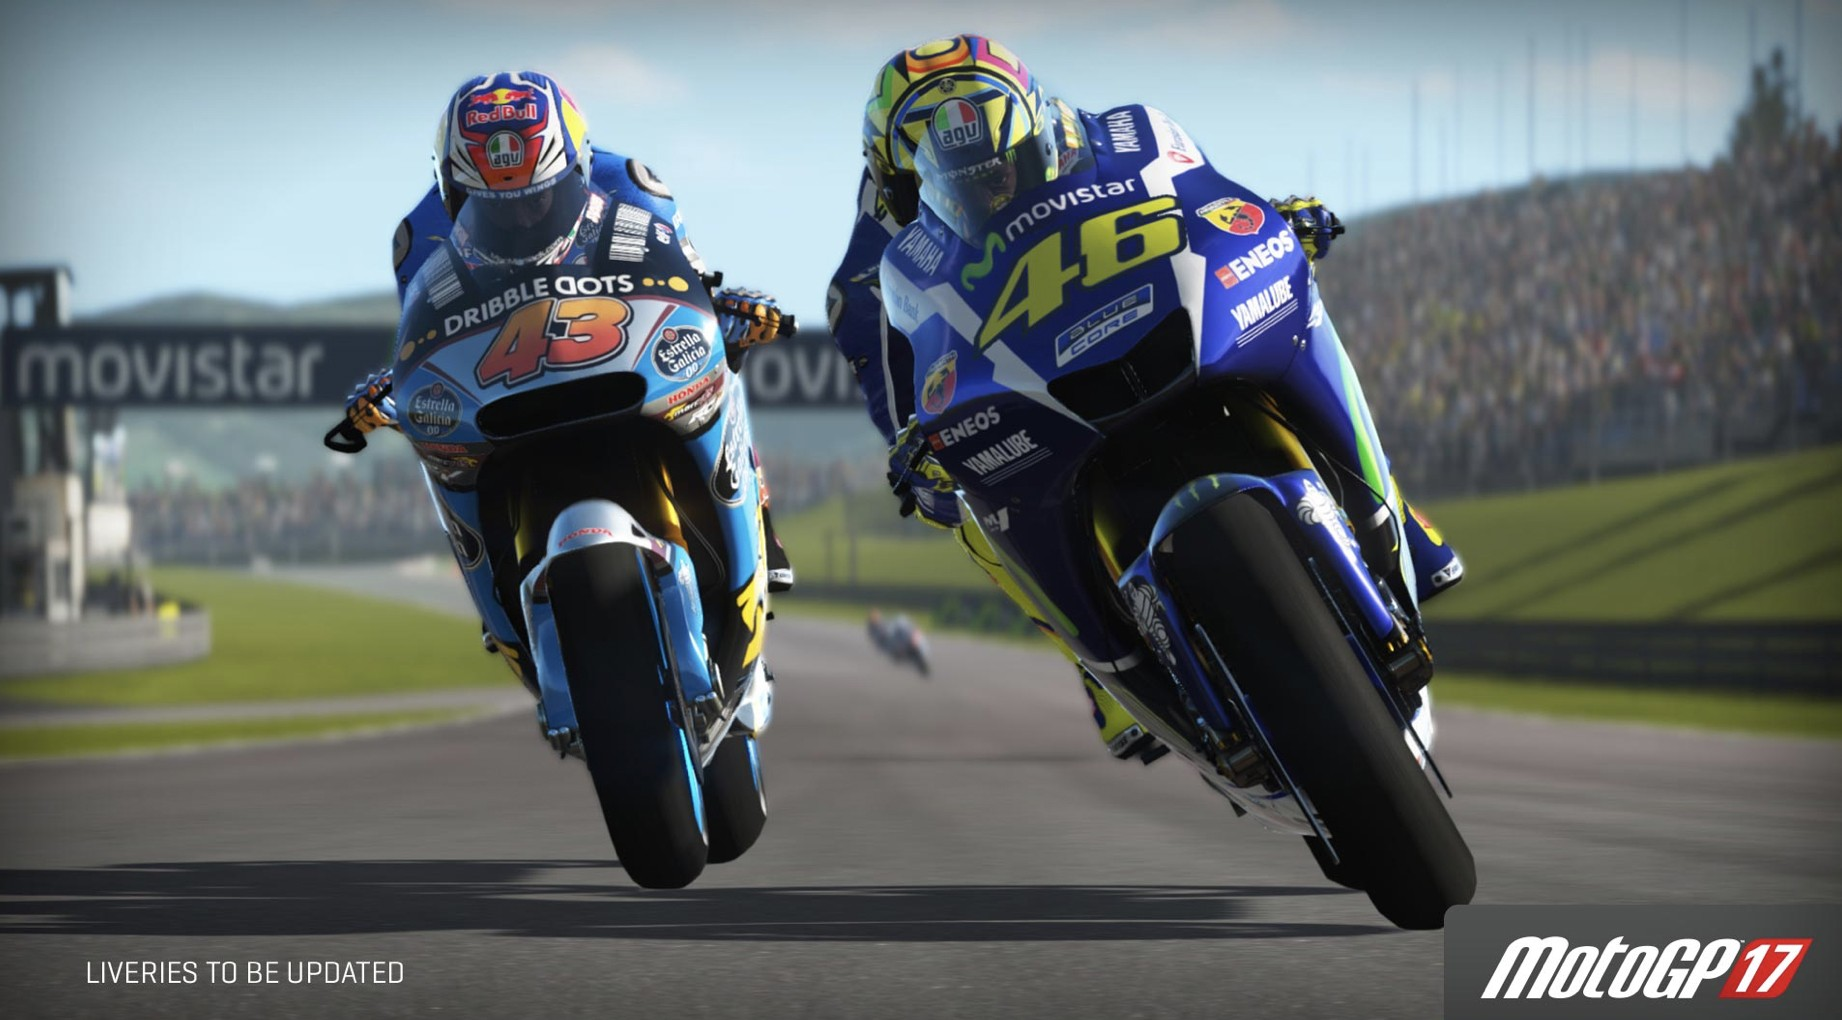 MotoGP 17 Screenshot #20 for PS4 - Operation Sports